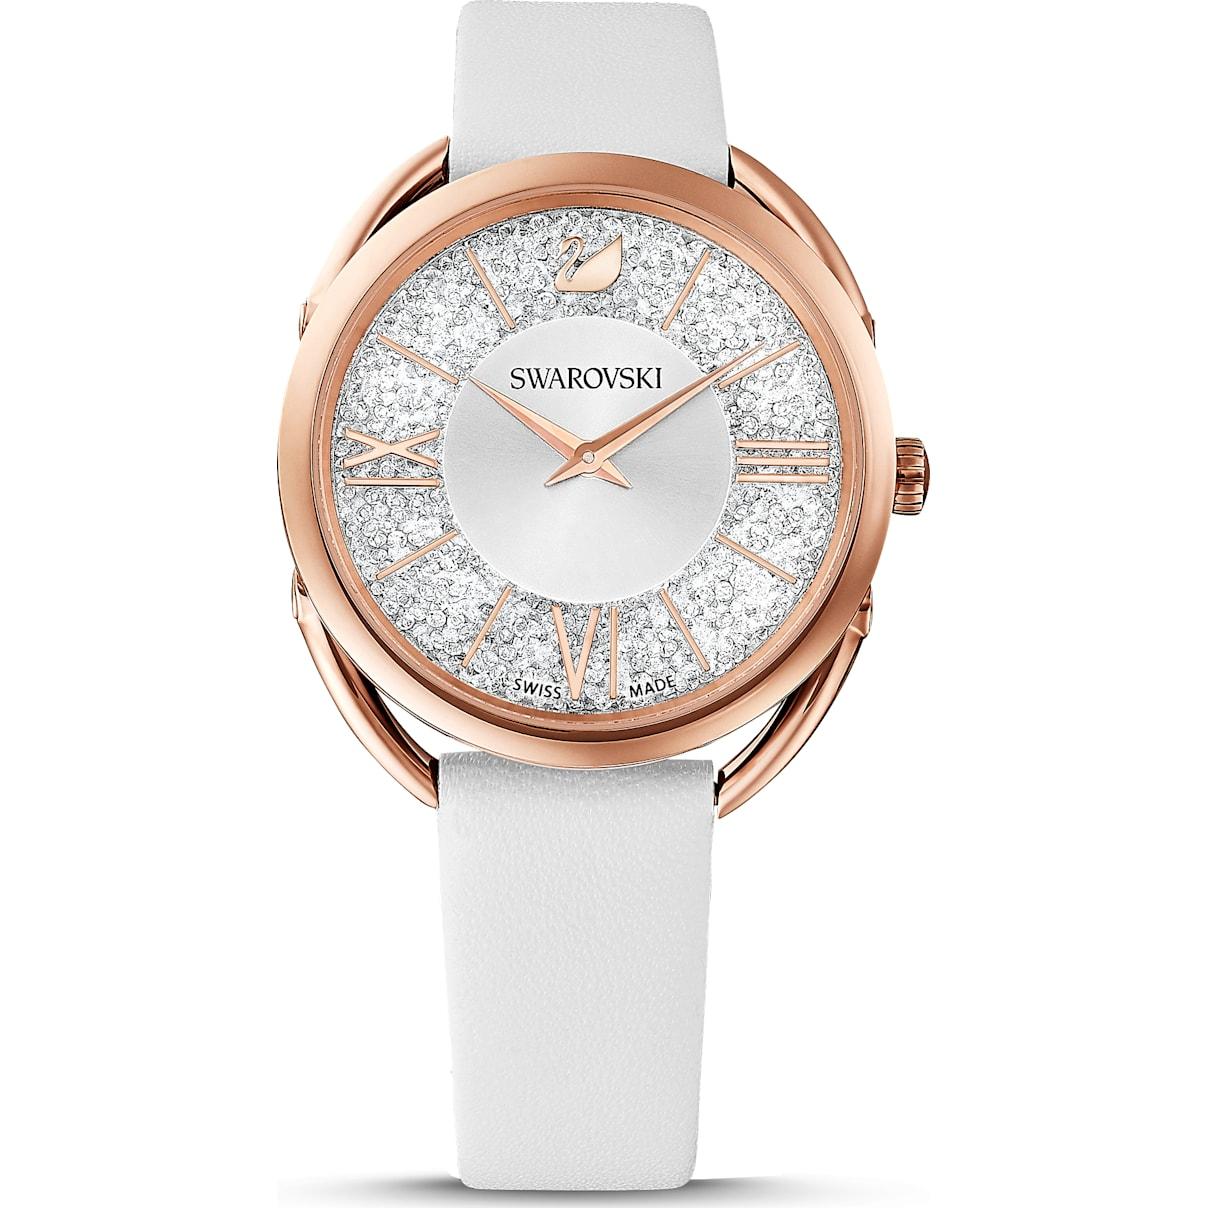 Swarovski Crystalline Glam Watch, Leather Strap, White, Rose-gold tone PVD